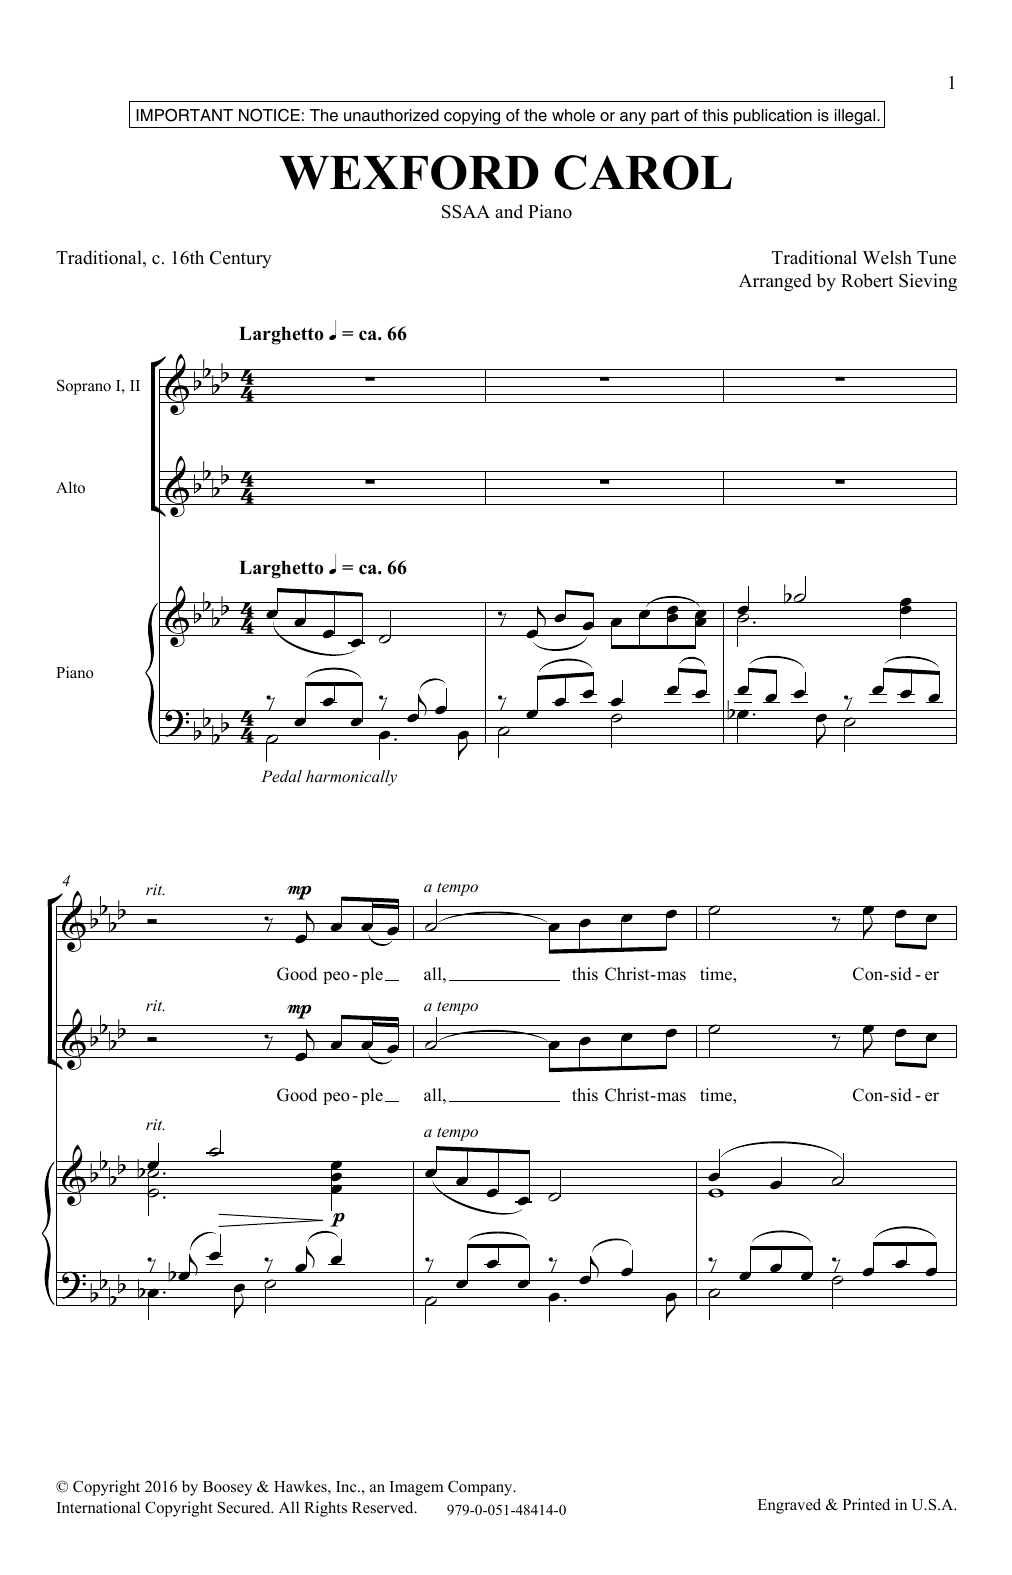 The Wexford Carol Sheet Music